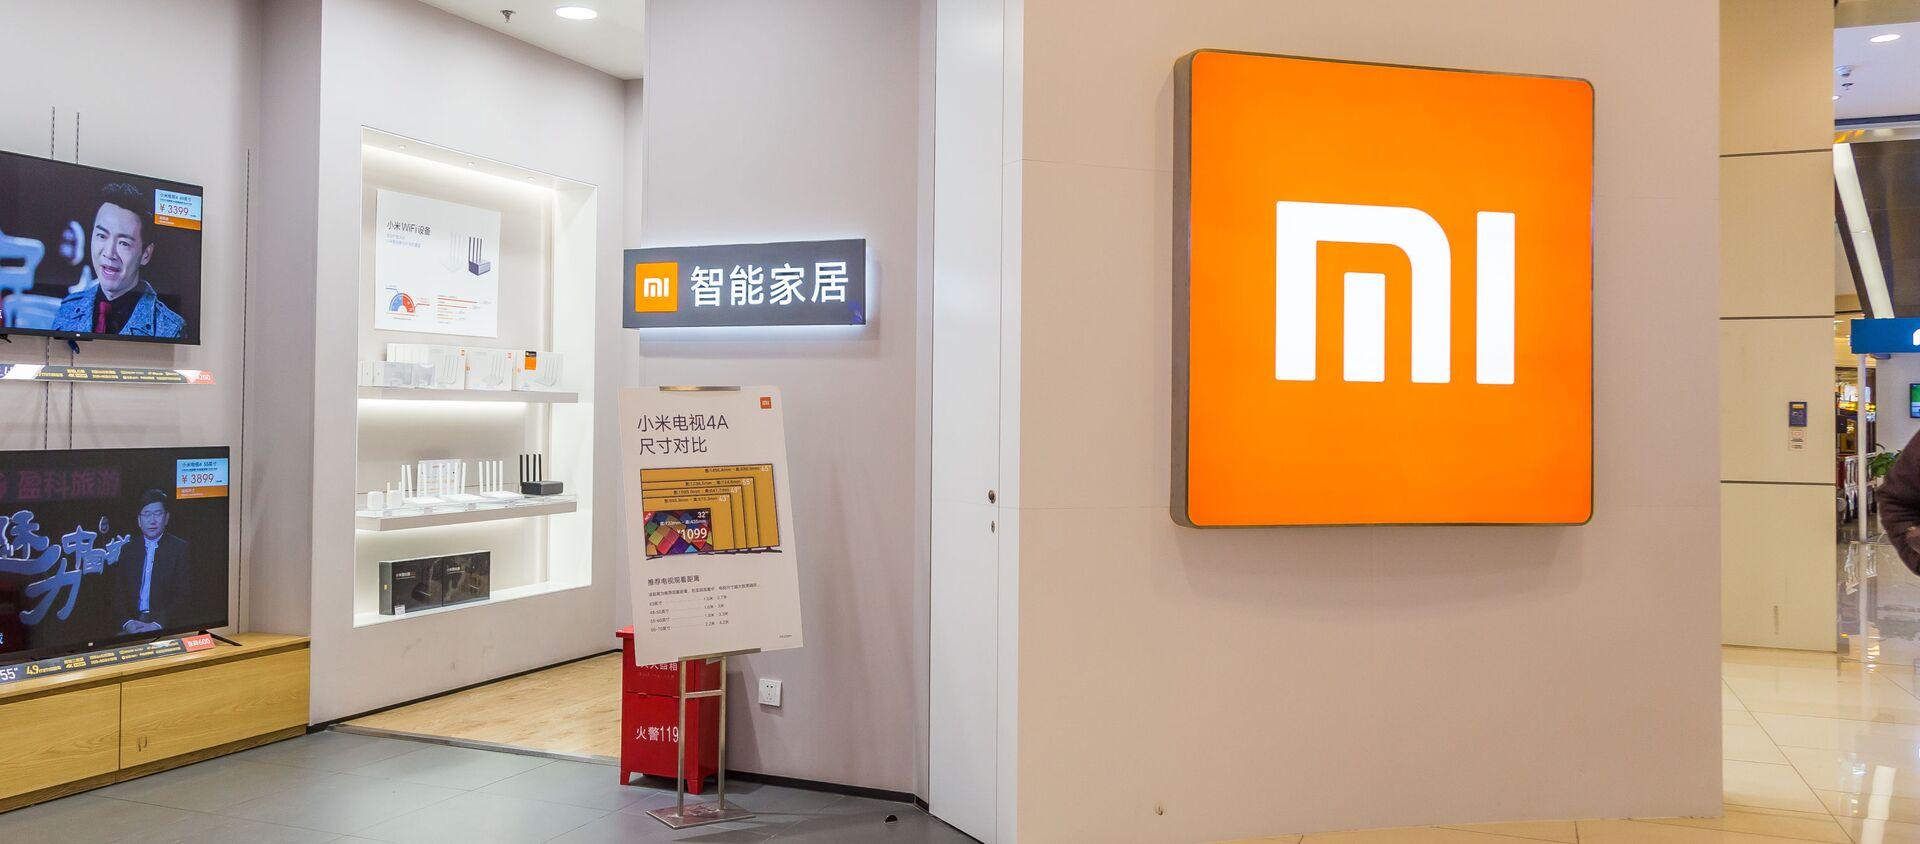 Cửa hàng Xiaomi ở Trung Quốc. - Sputnik Việt Nam, 1920, 12.05.2021